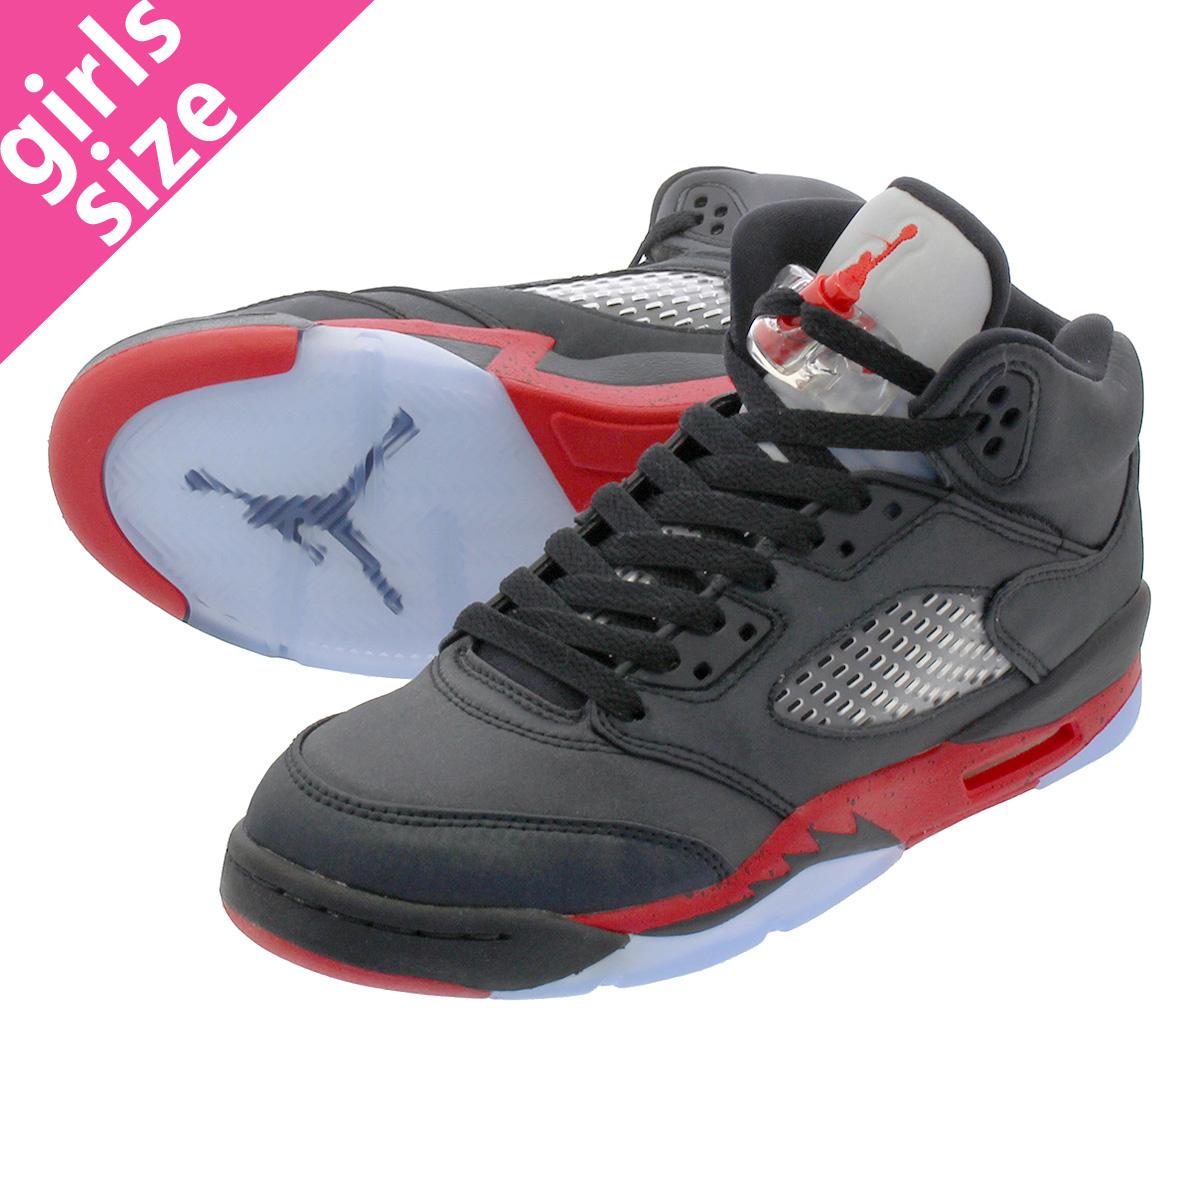 sneakers for cheap a0411 38091 NIKE AIR JORDAN 5 RETRO GS Nike Air Jordan 5 nostalgic GS BLACK UNIVERSITY RED  440,888-006